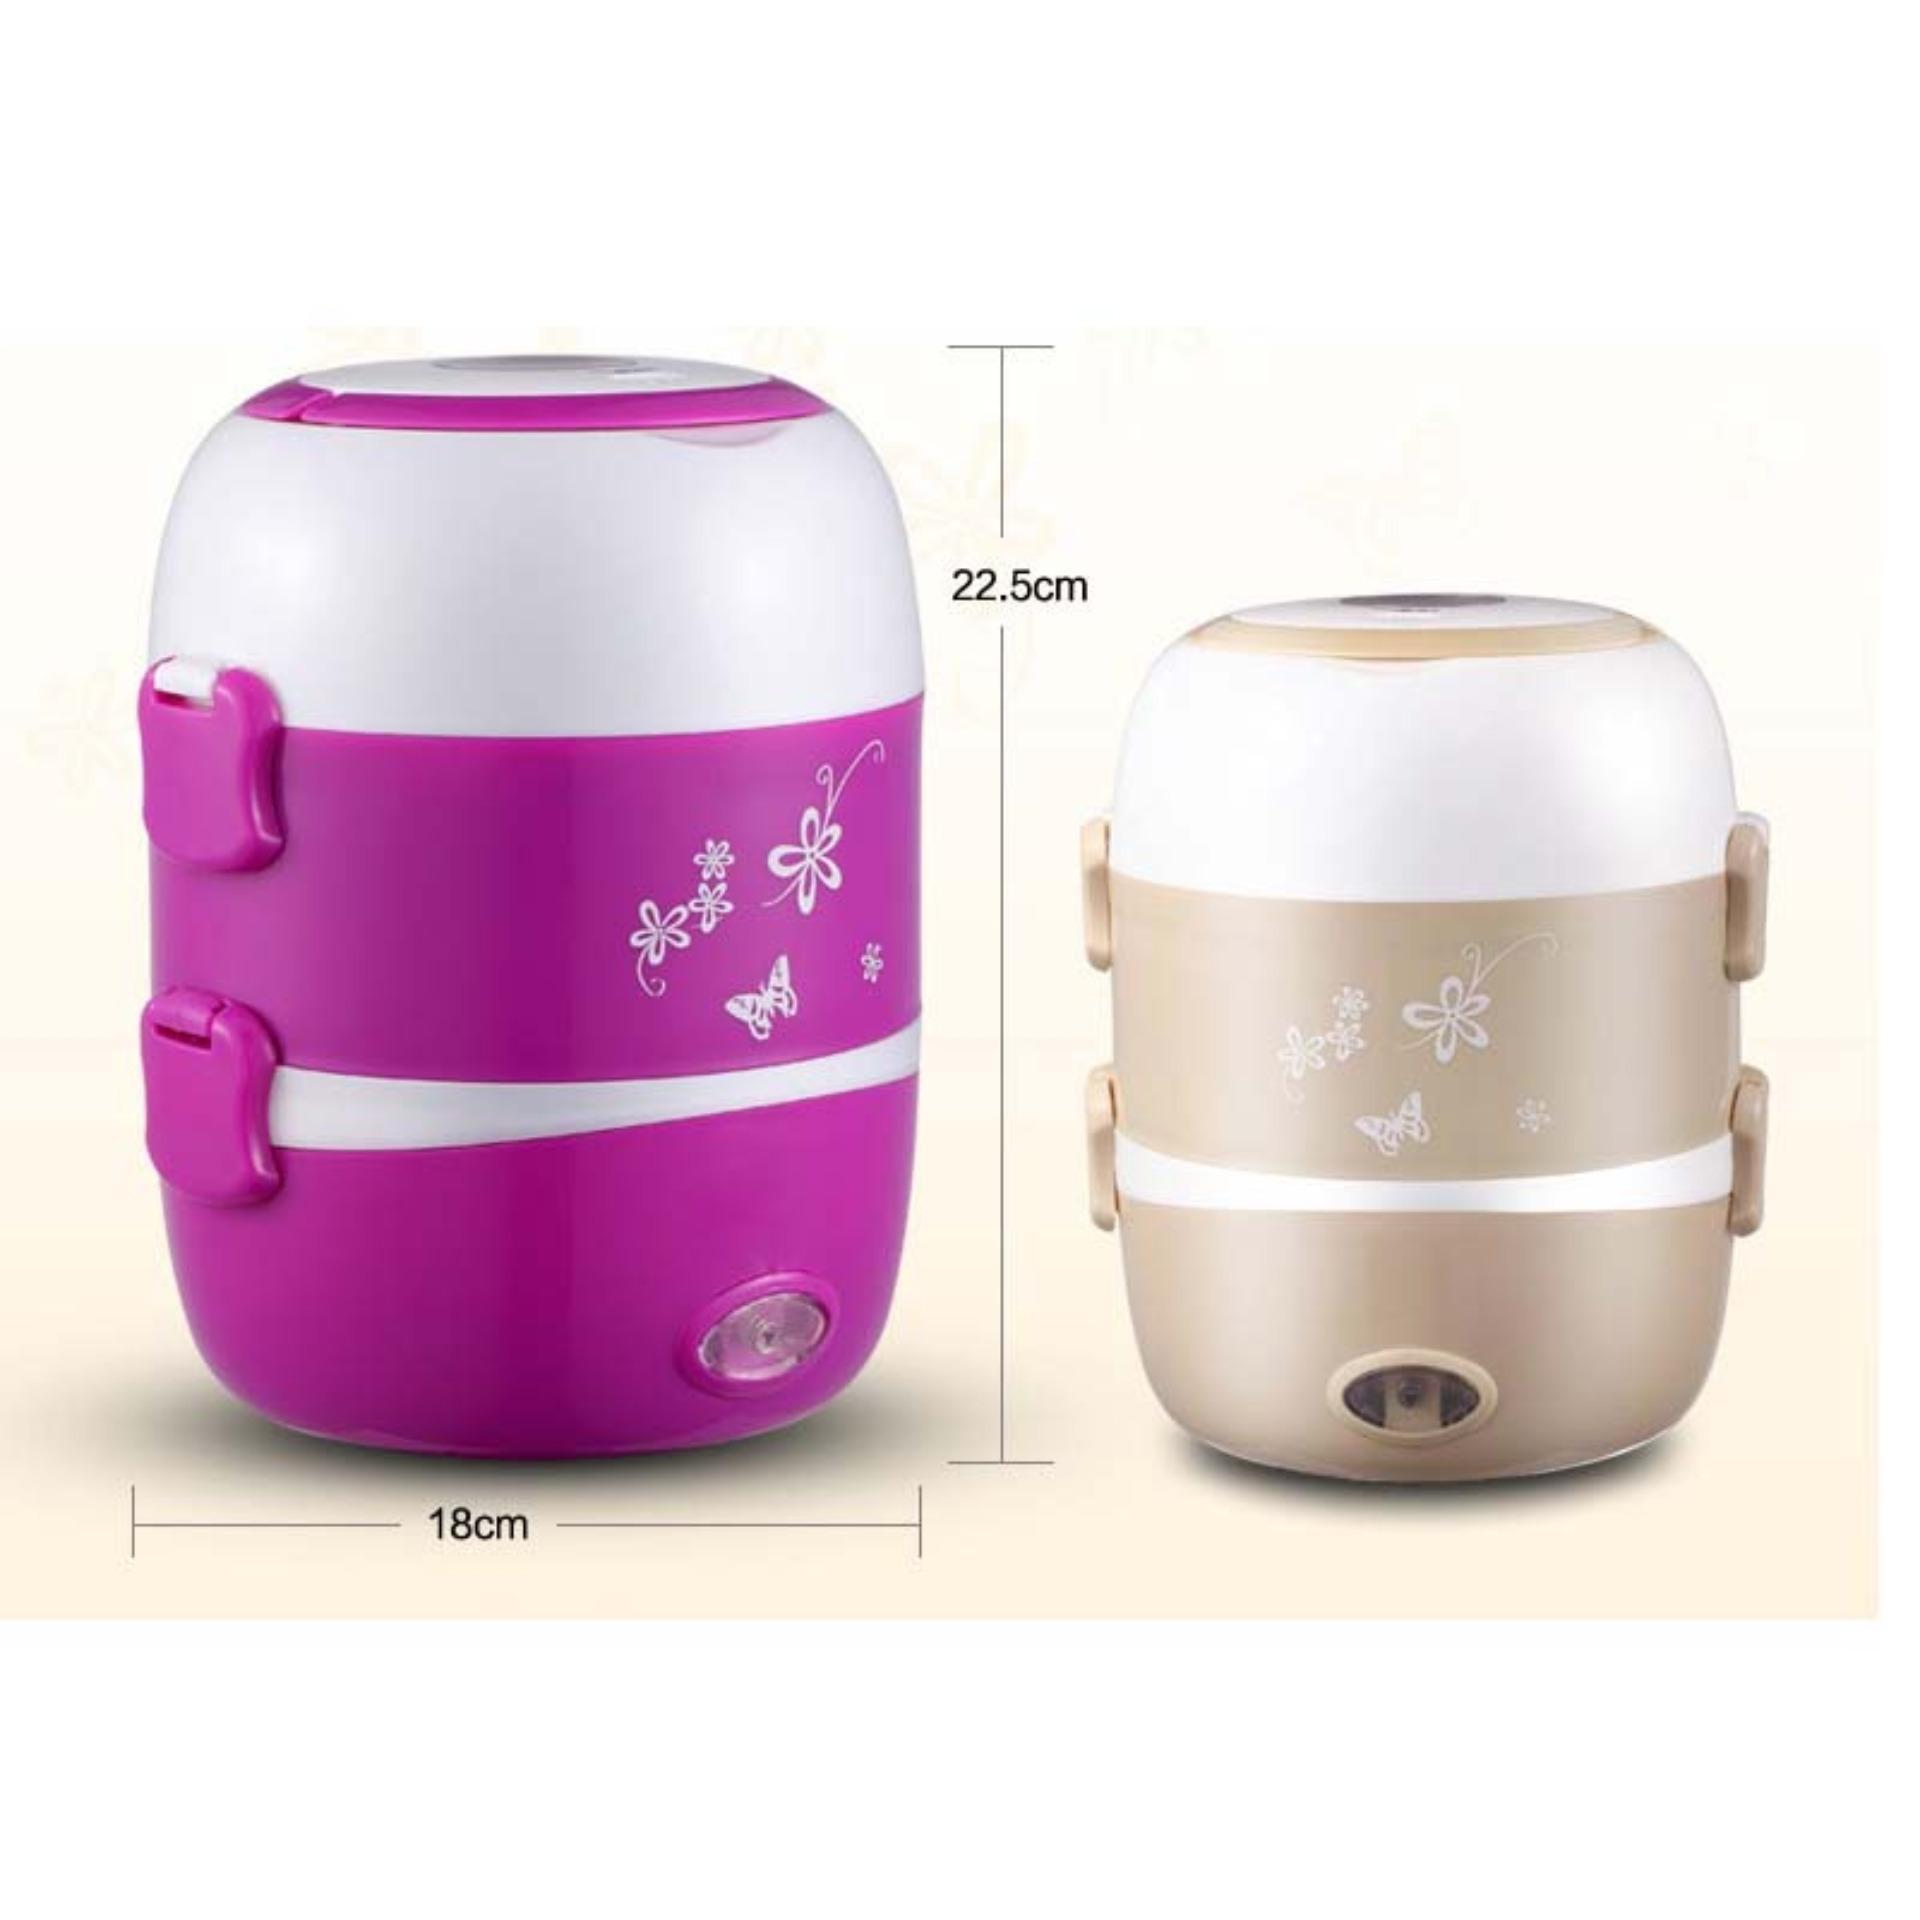 ... StarHome Rice Cooker Mini 3 Susun kapasitas 2 L - Penanak Nasi Mini - Egg Boiler ...